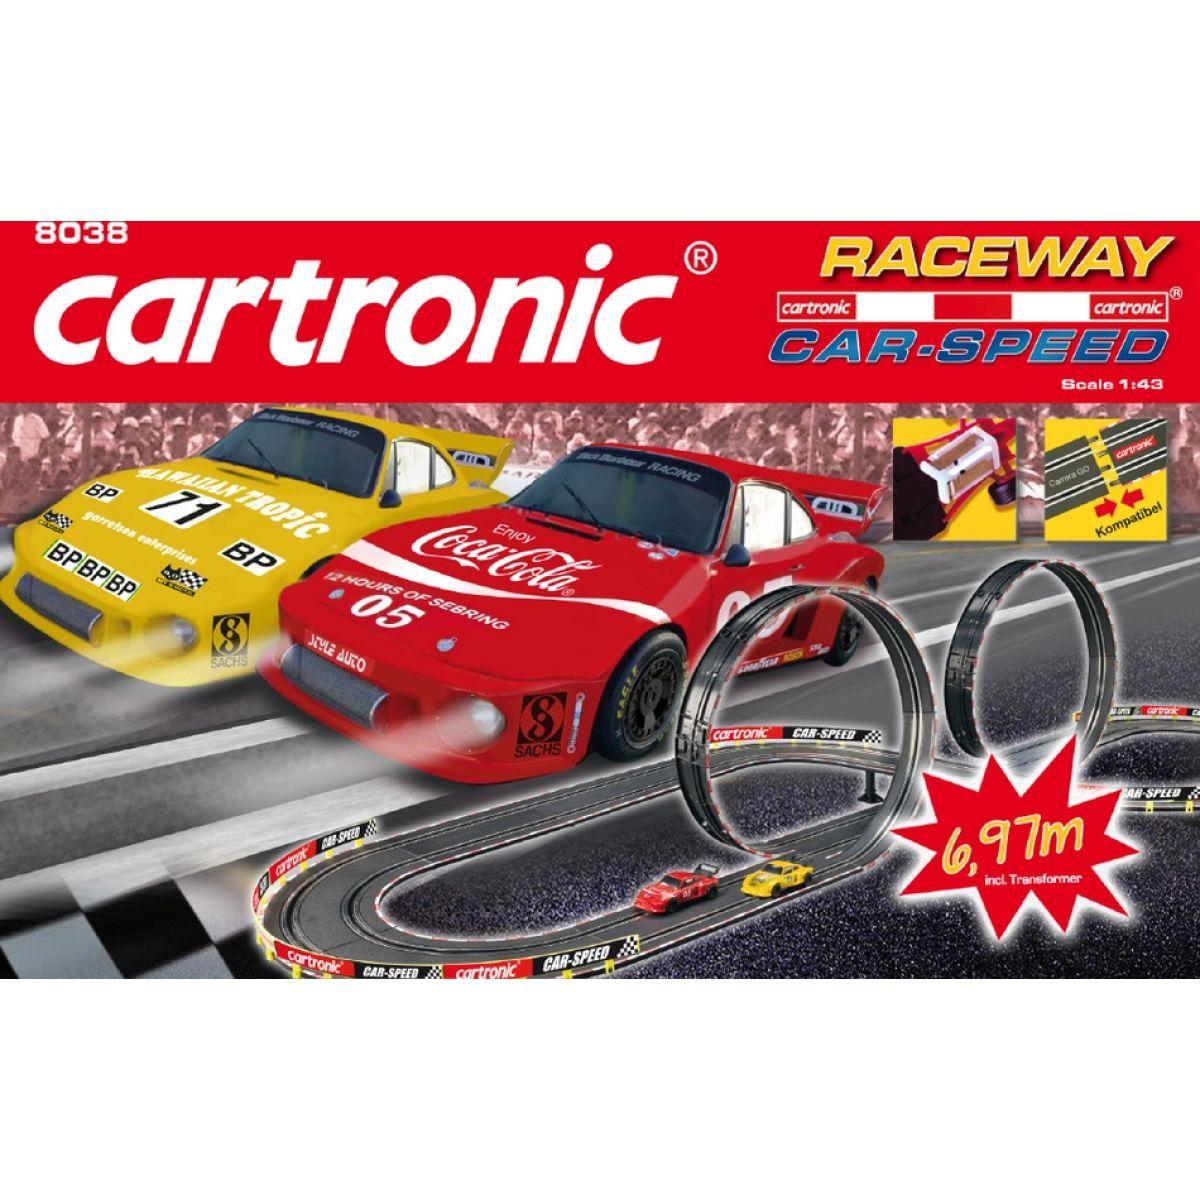 Cartronic autodráha Raceway